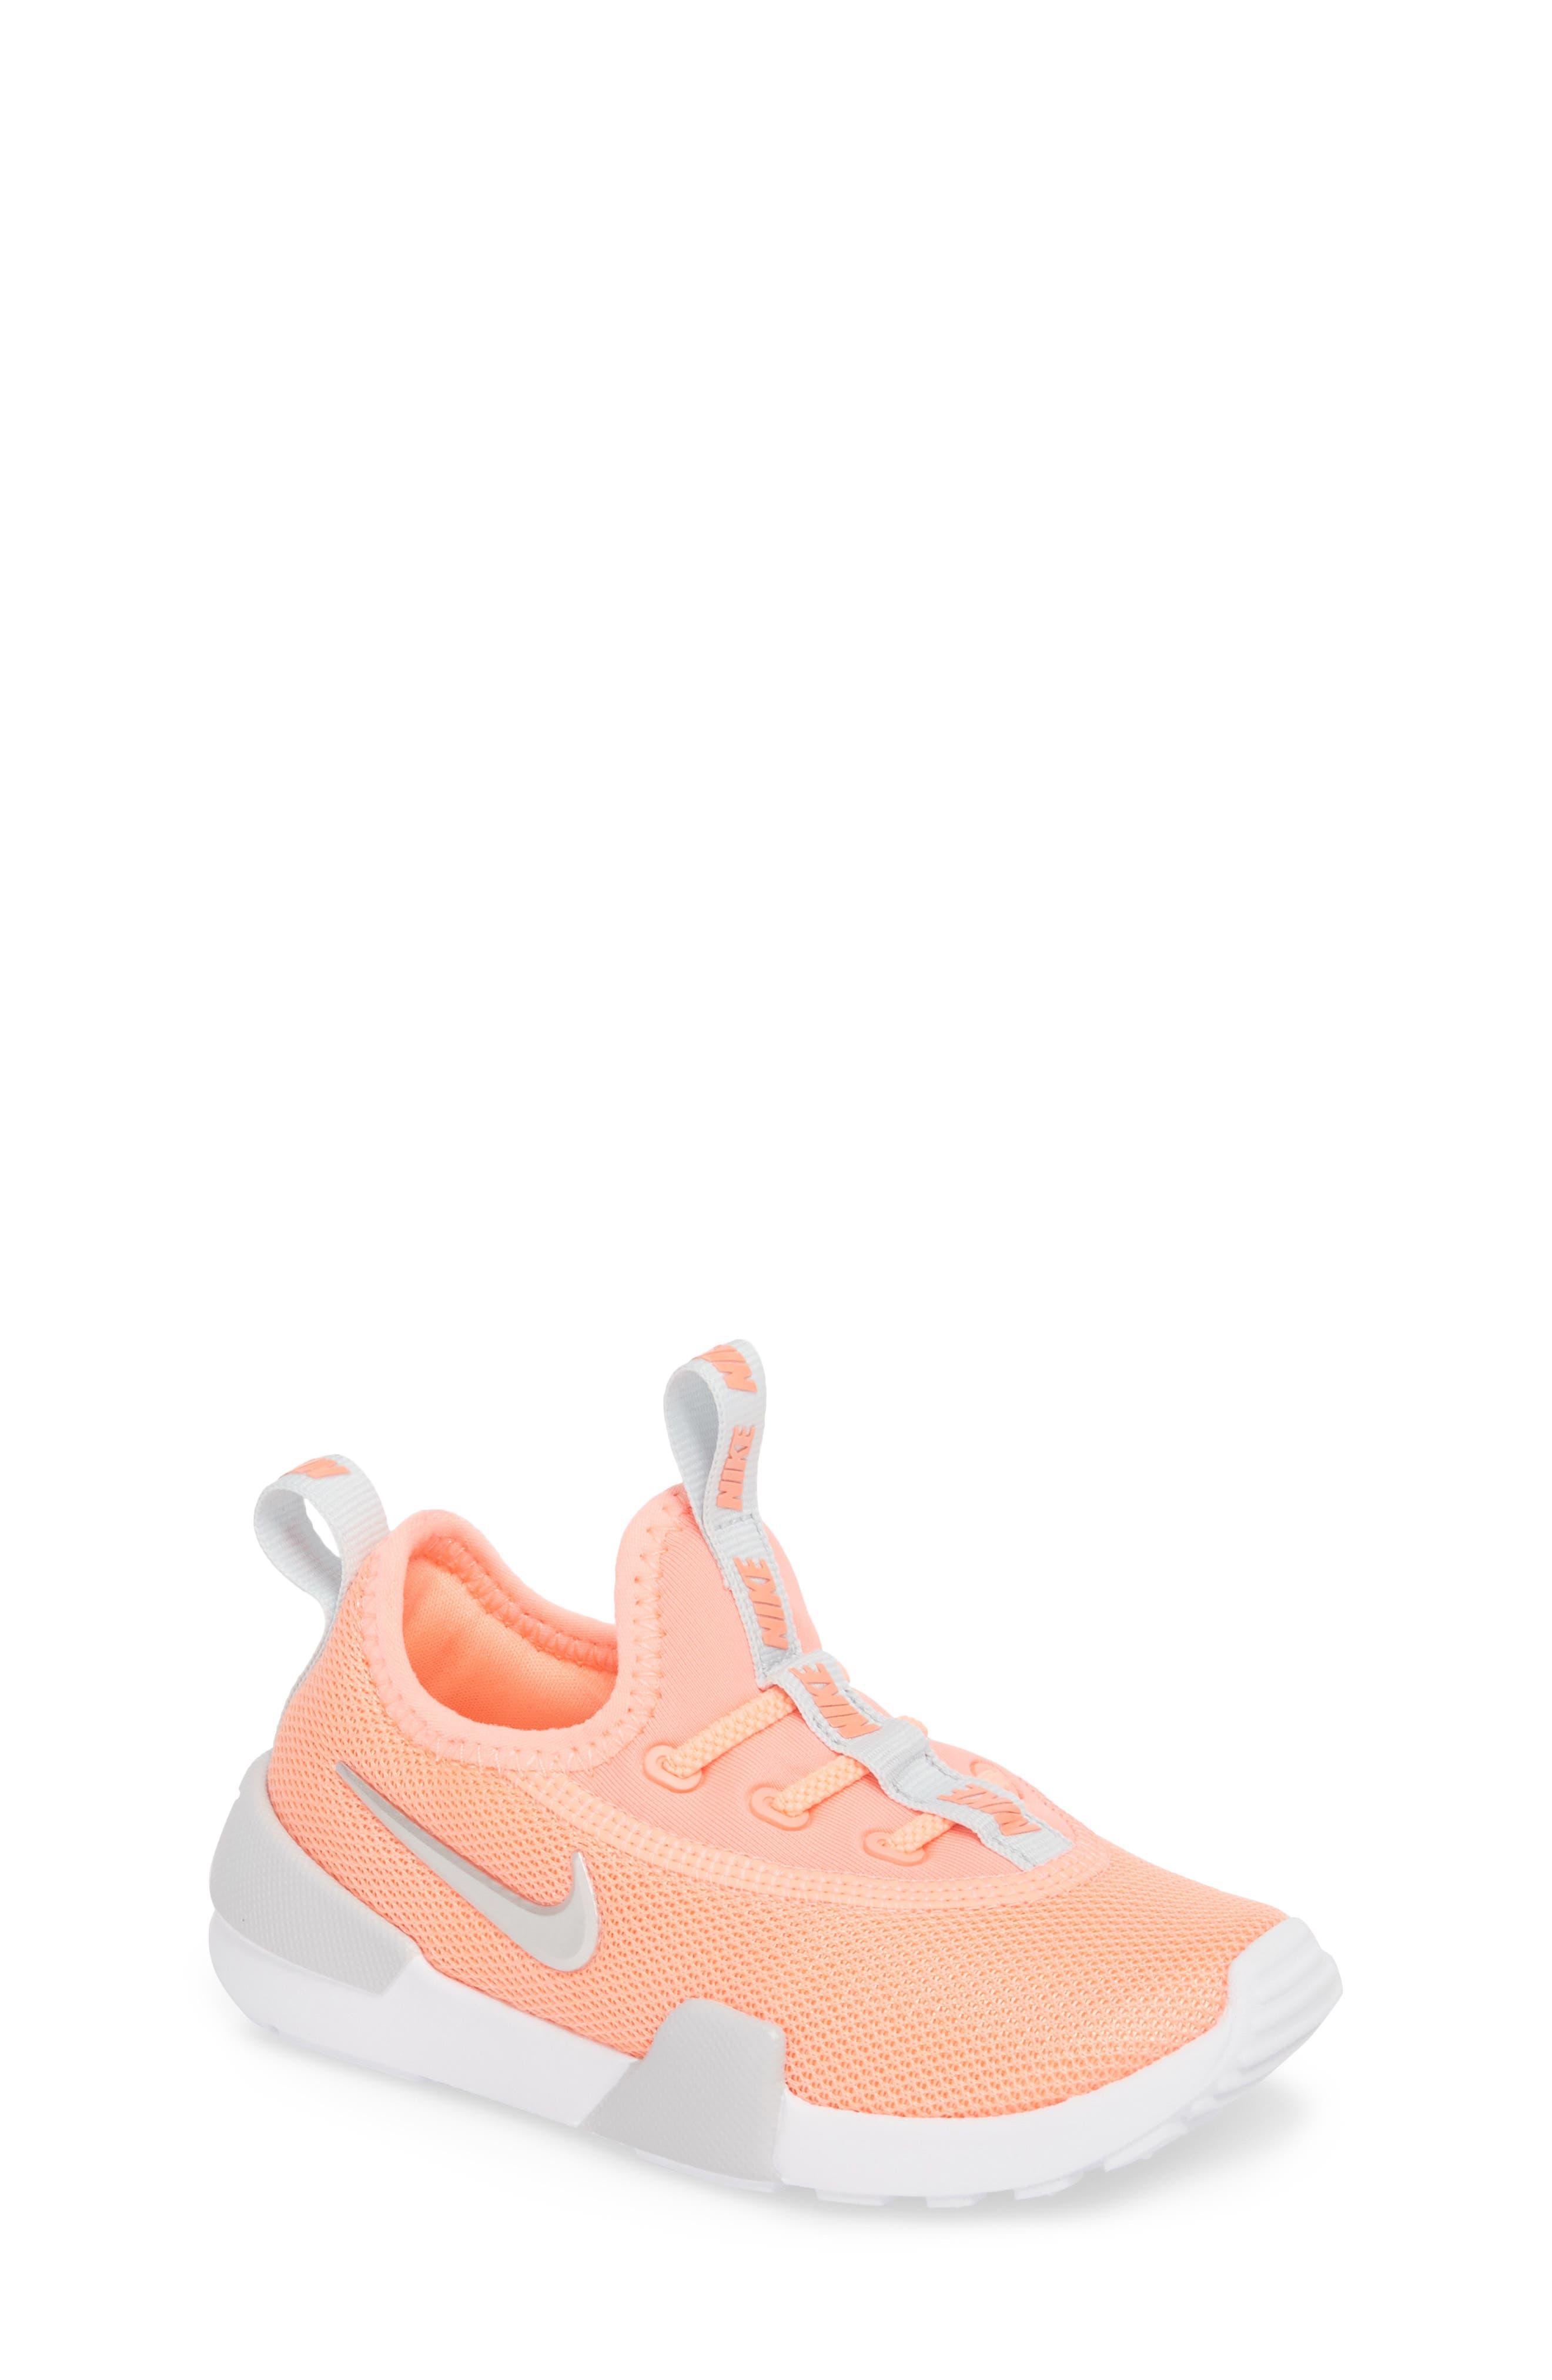 Ashin Modern Sock Knit Sneaker,                         Main,                         color, ATOMIC PINK/ METALLIC SILVER